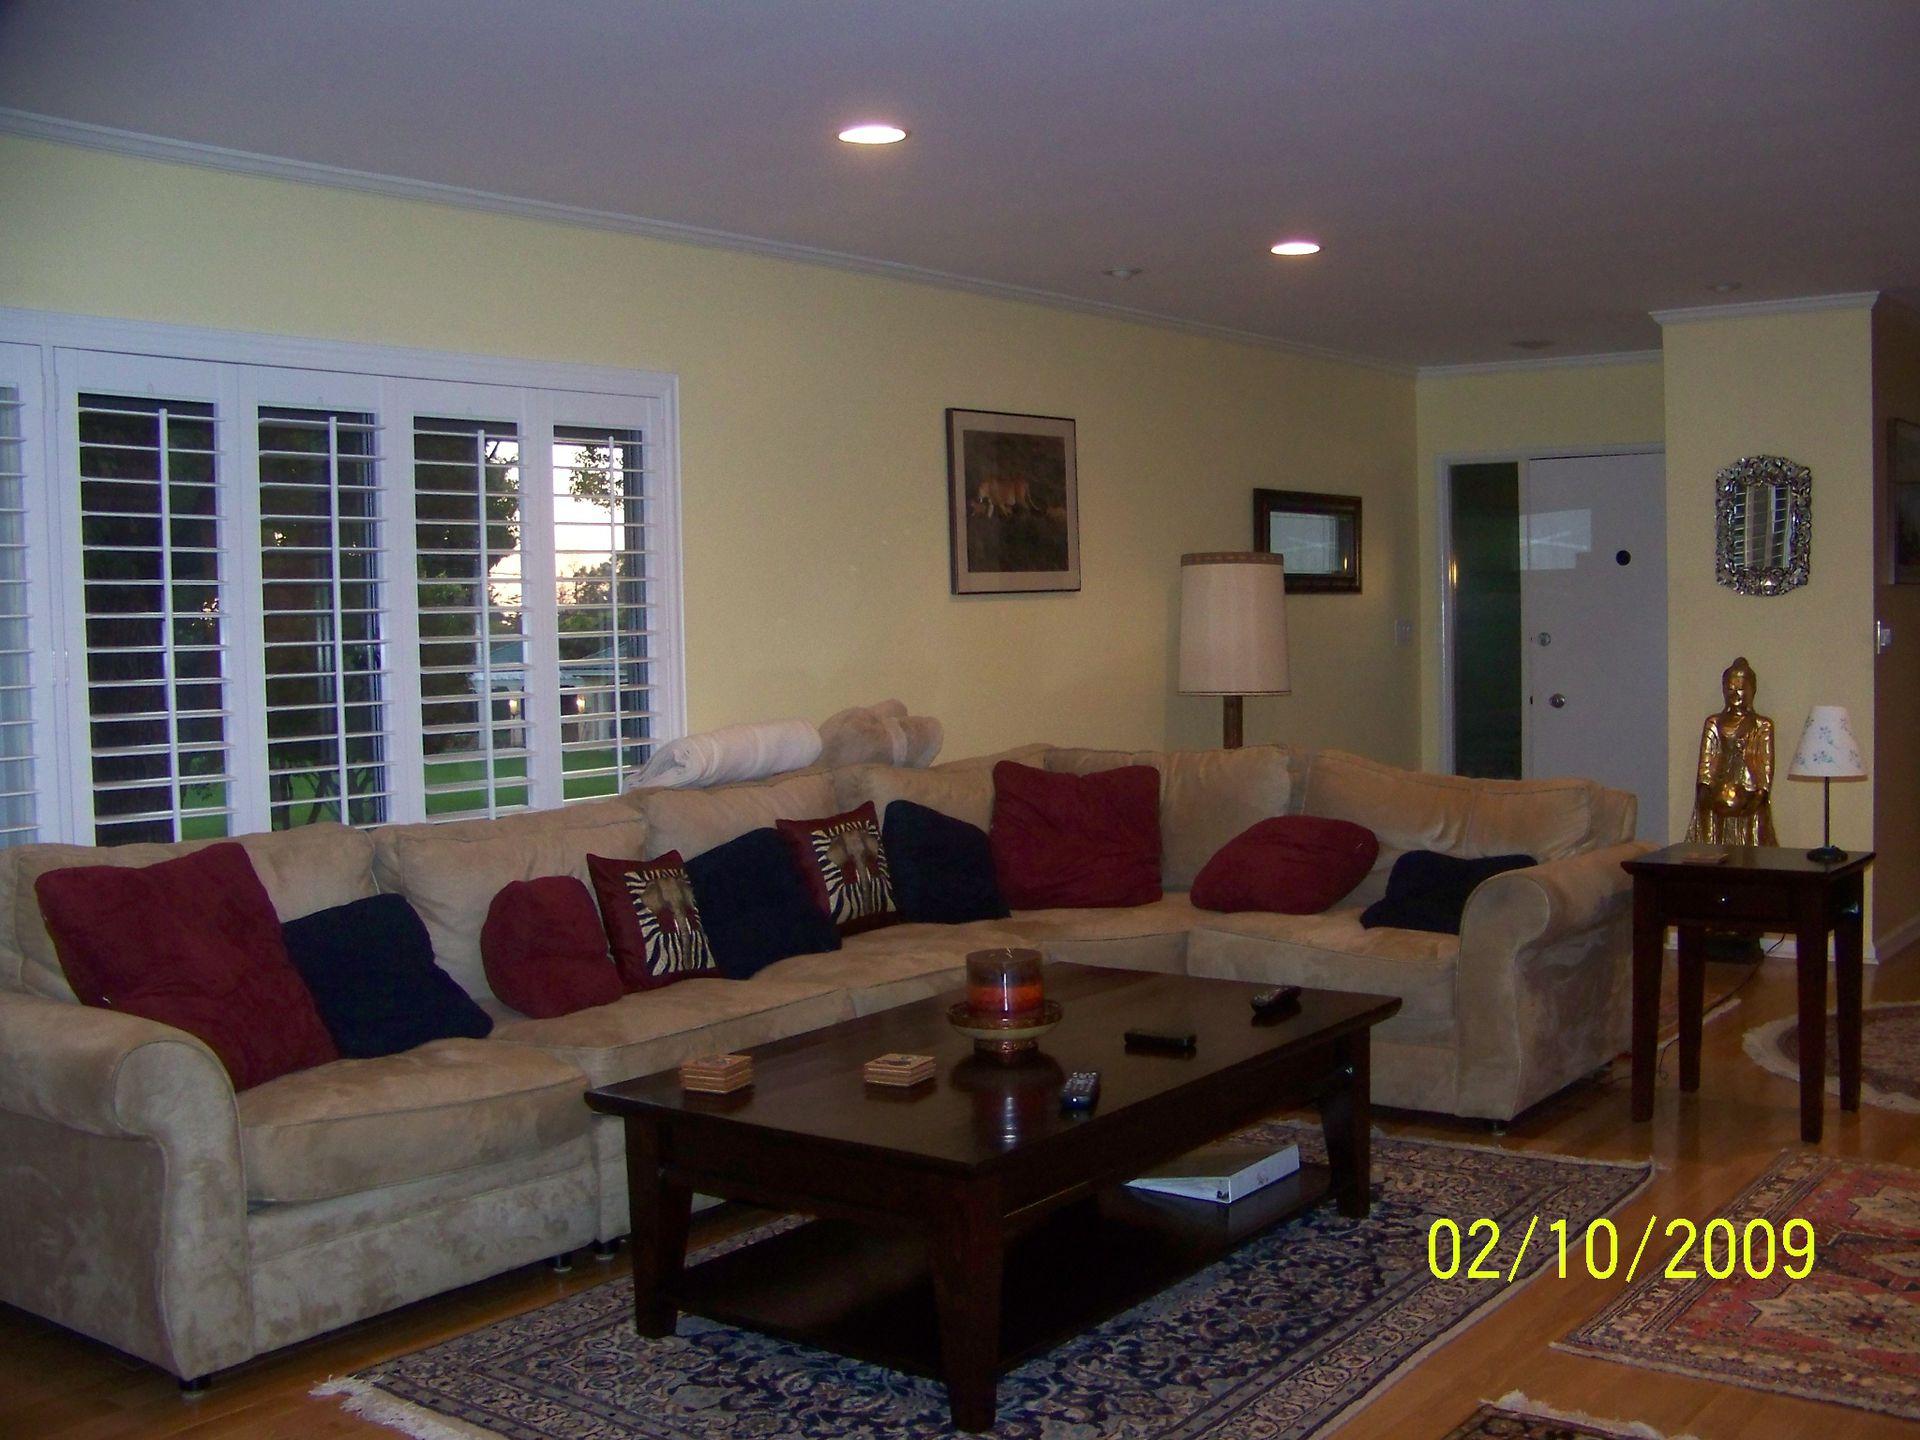 Elegant condominium in upscale neighborhood of Pasadena, Ca ...